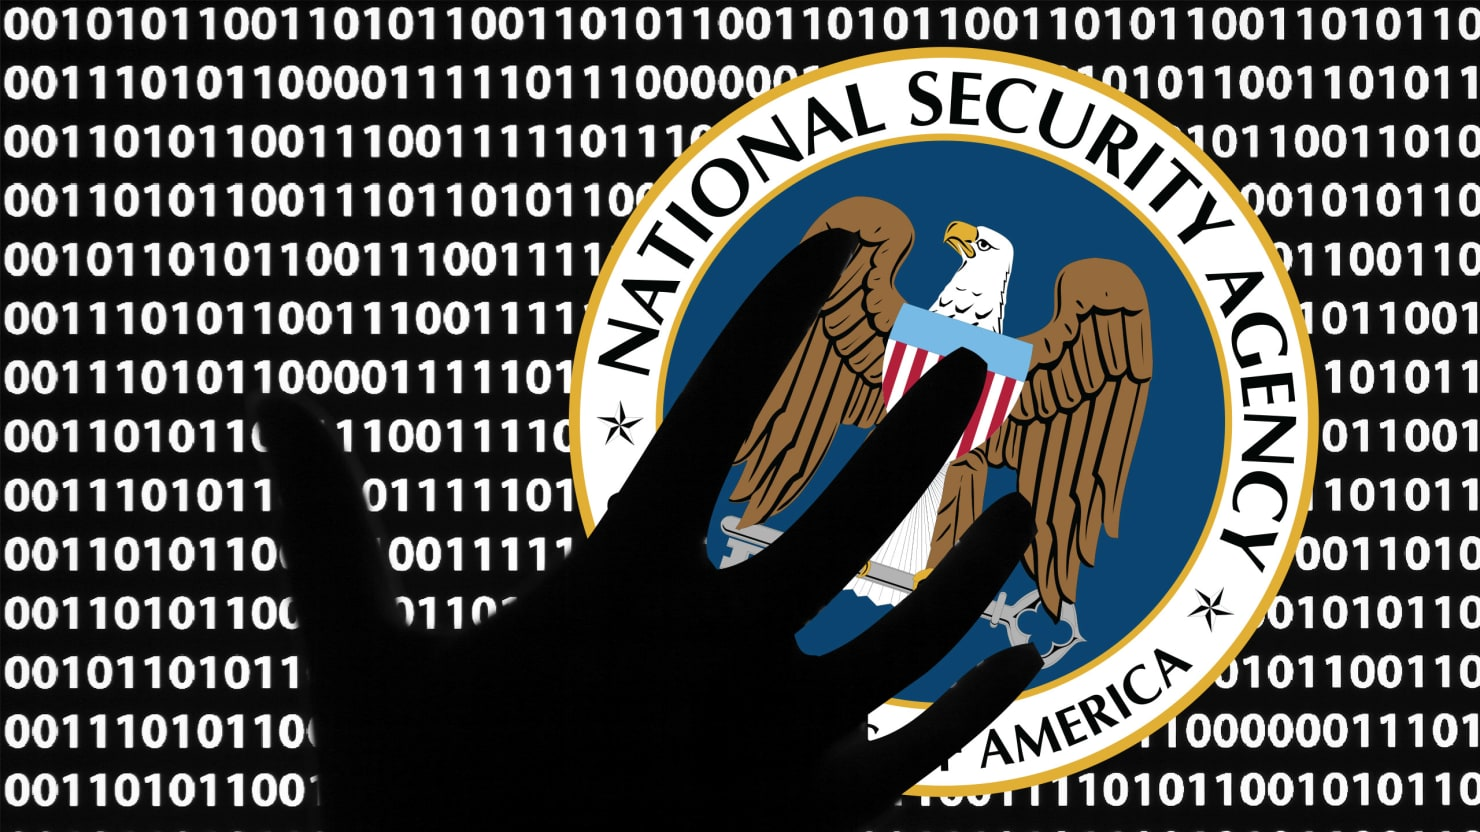 Canale Sicurezza - Kaspersky - attacco hacker USA